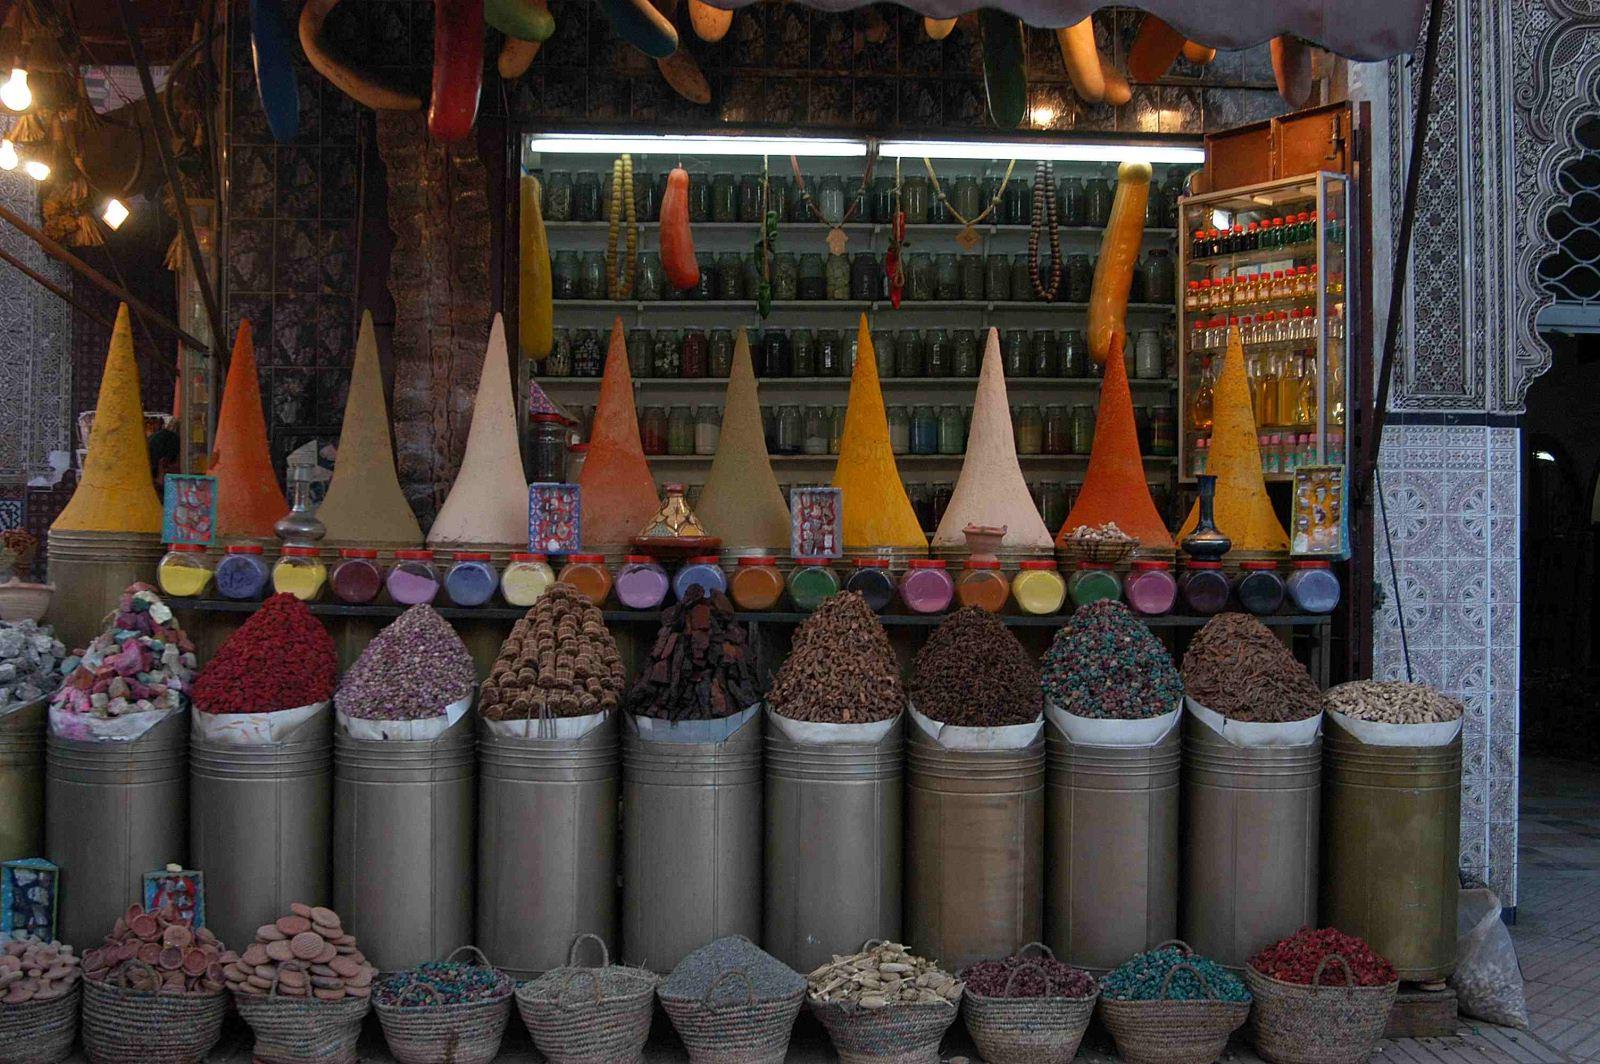 Moroccoc